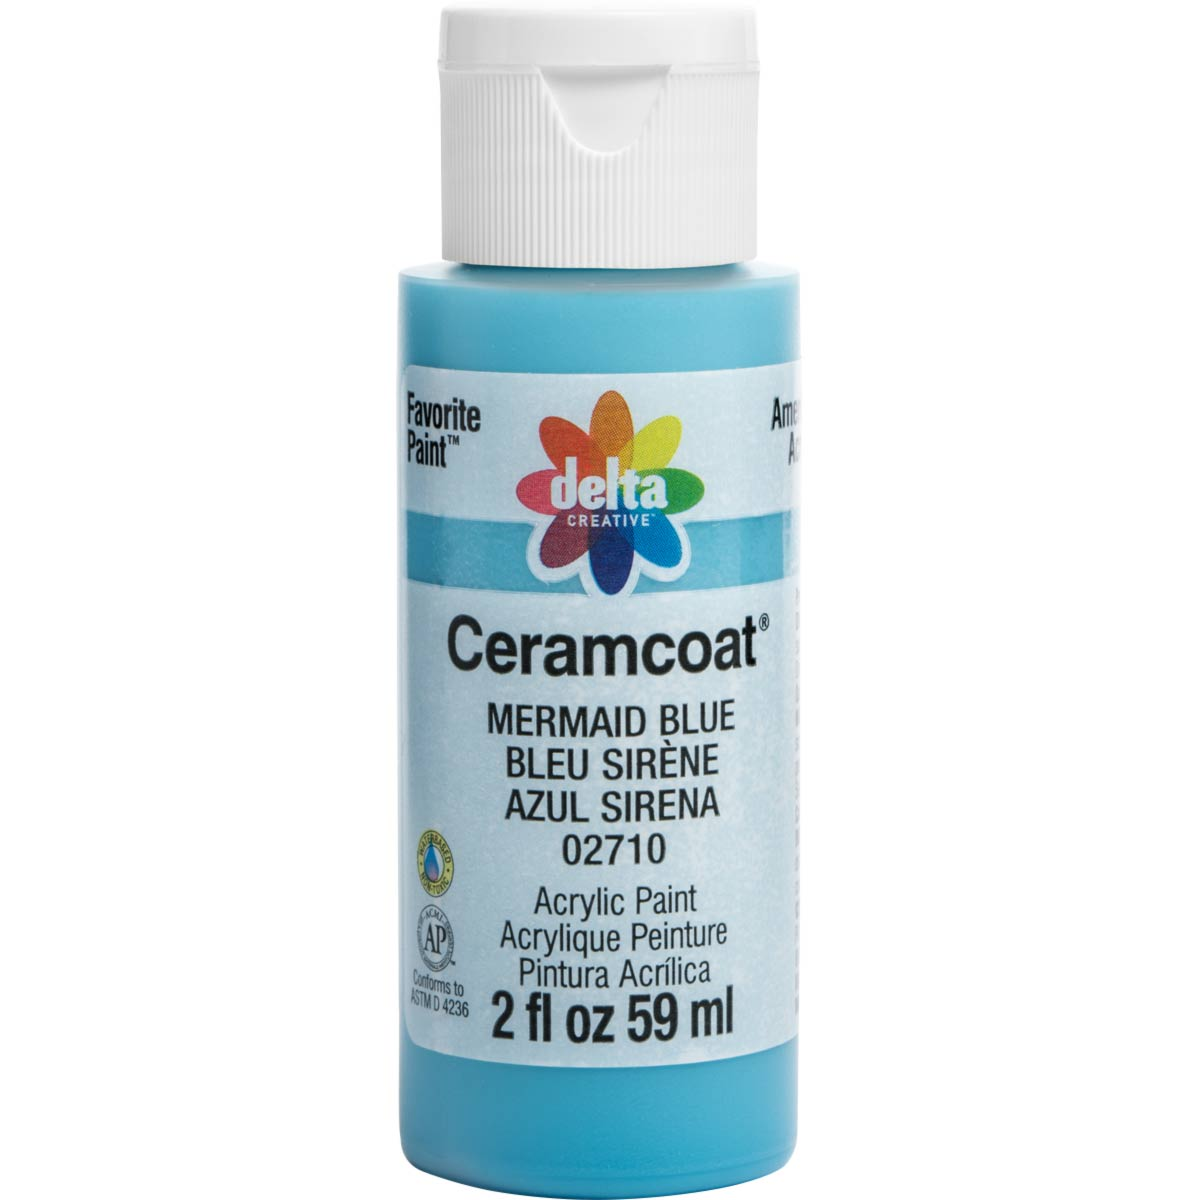 Delta Ceramcoat ® Acrylic Paint - Mermaid Blue, 2 oz. - 02710